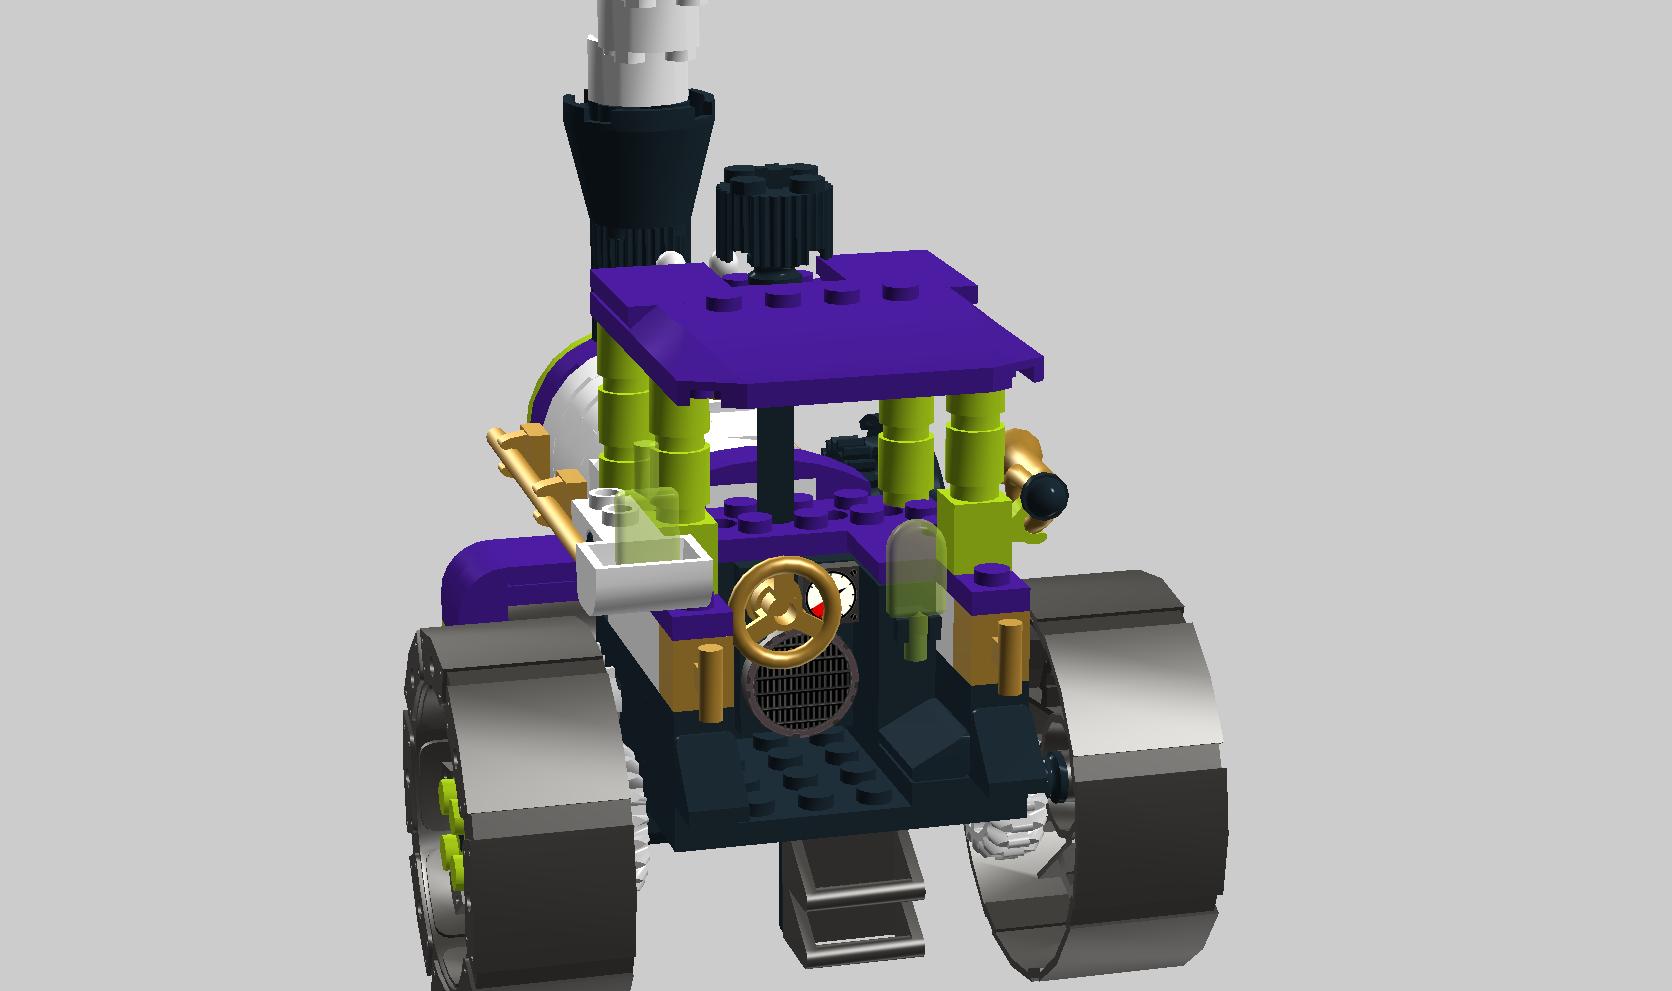 Image - Jokersteamroller5.png - Brickipedia, the LEGO Wiki